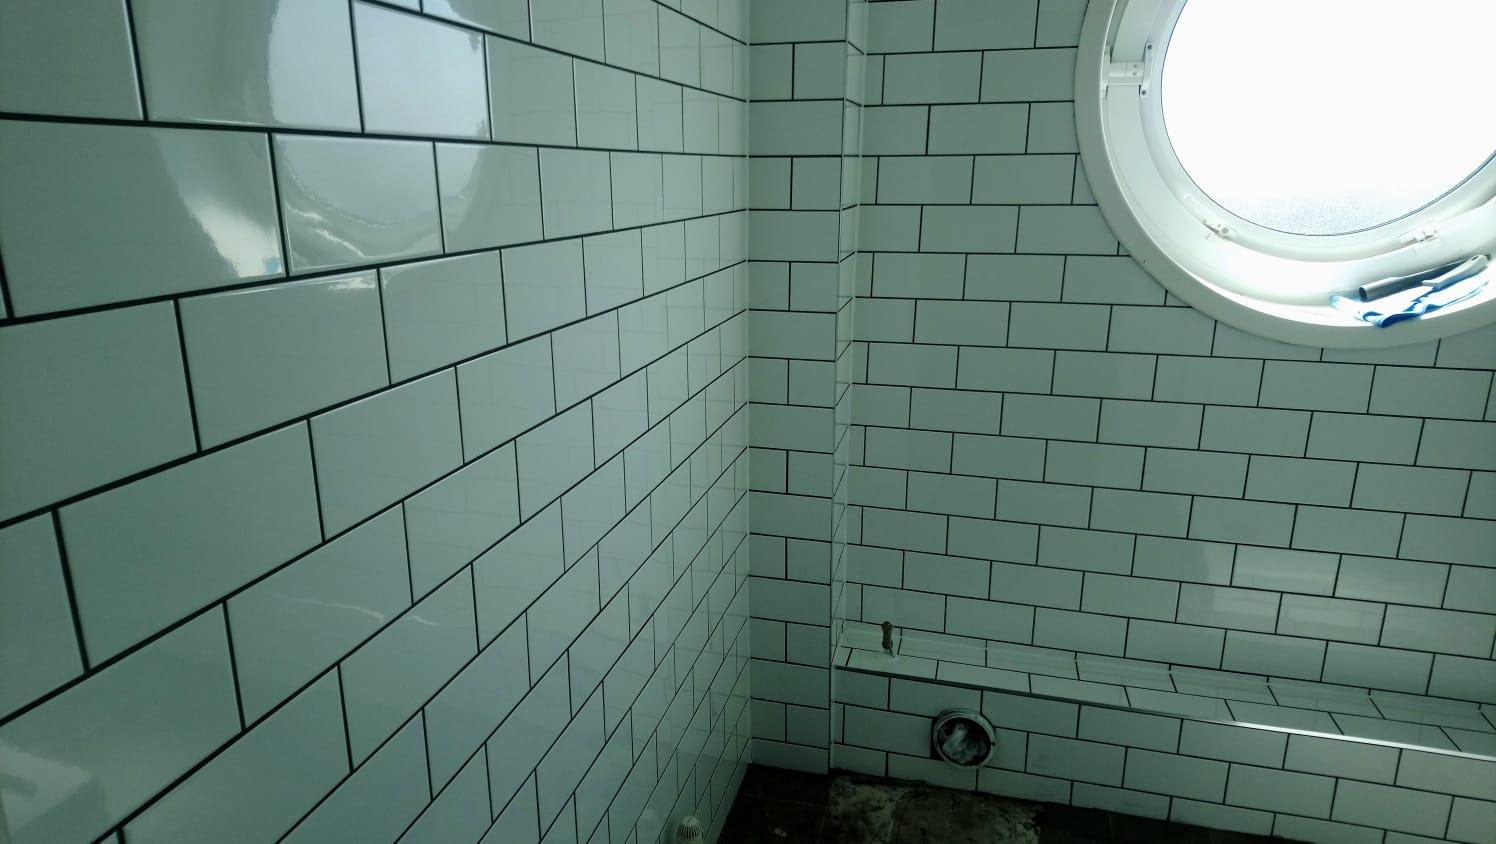 Main photo for D & L Tiling